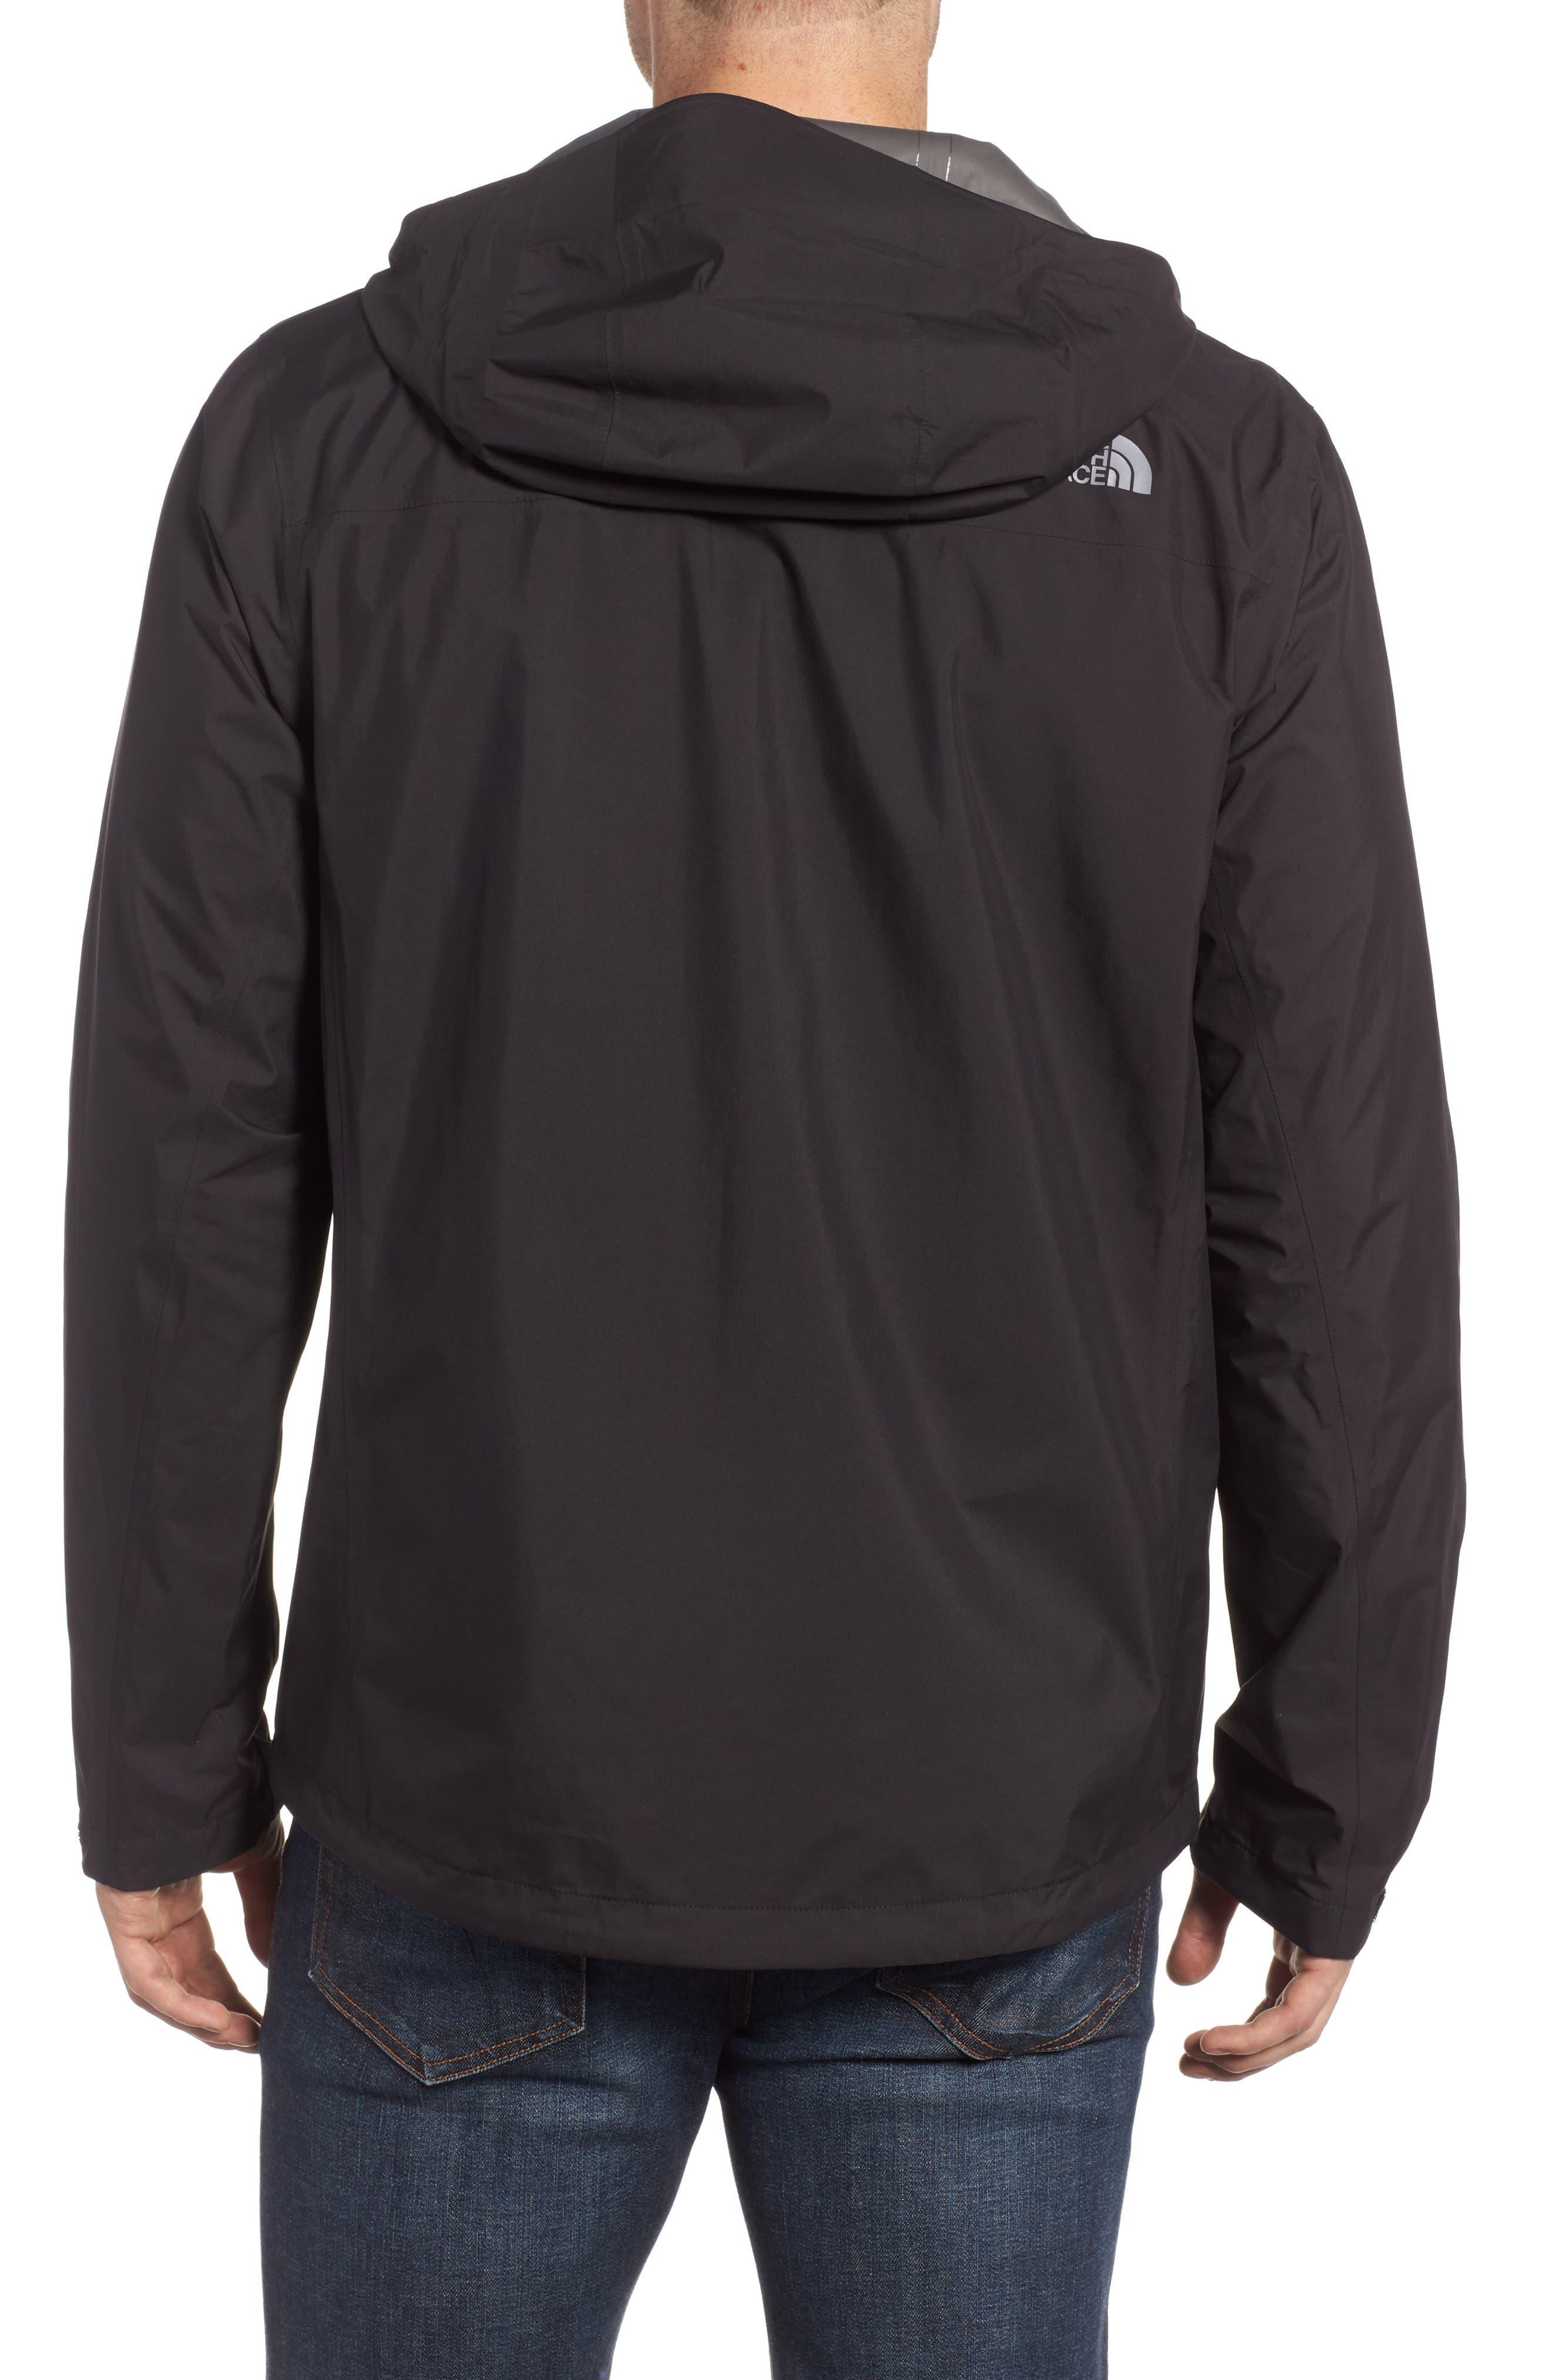 Dryzzle Gore-Tex<sup>®</sup> PacLite Hooded Jacket,                             Alternate thumbnail 2, color,                             001